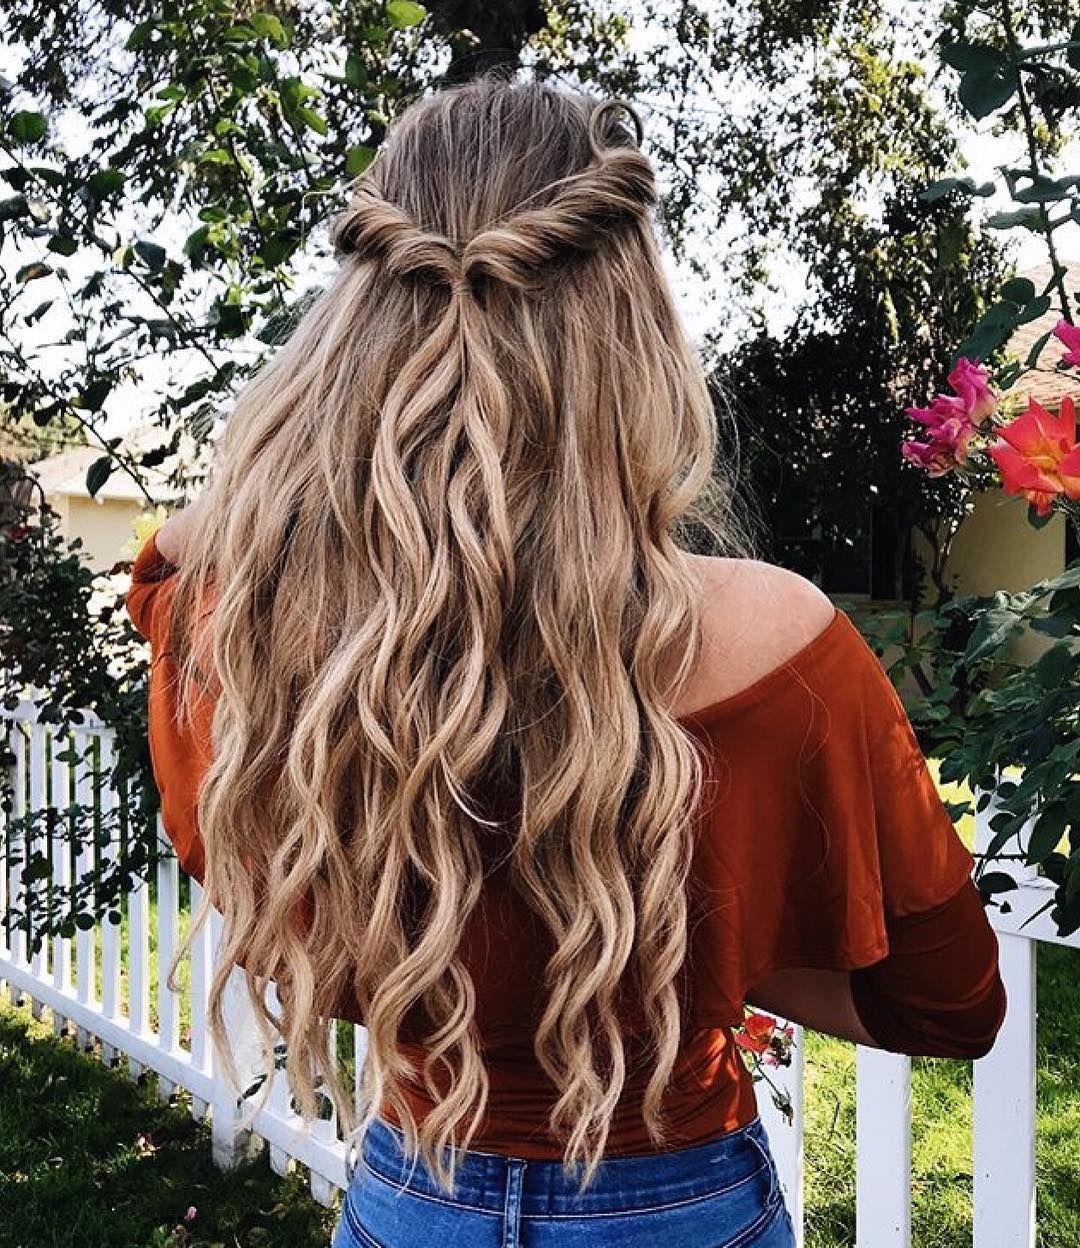 pin braids & tails buns